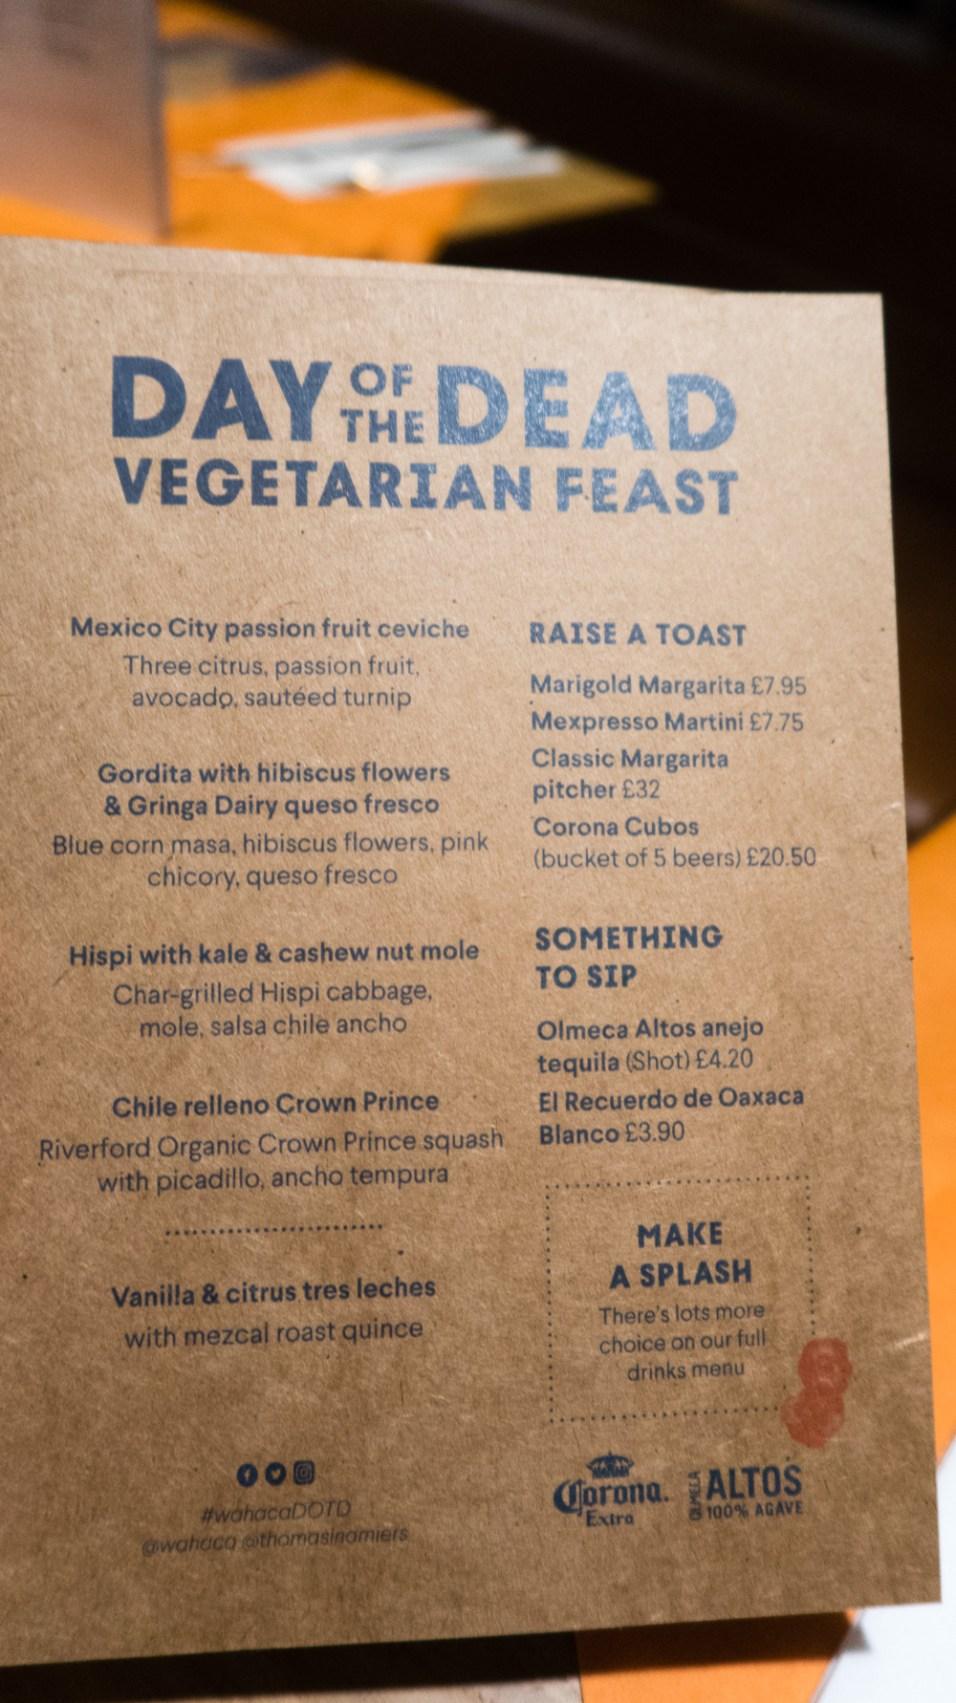 Day of the Dead Feast vegetarian menu